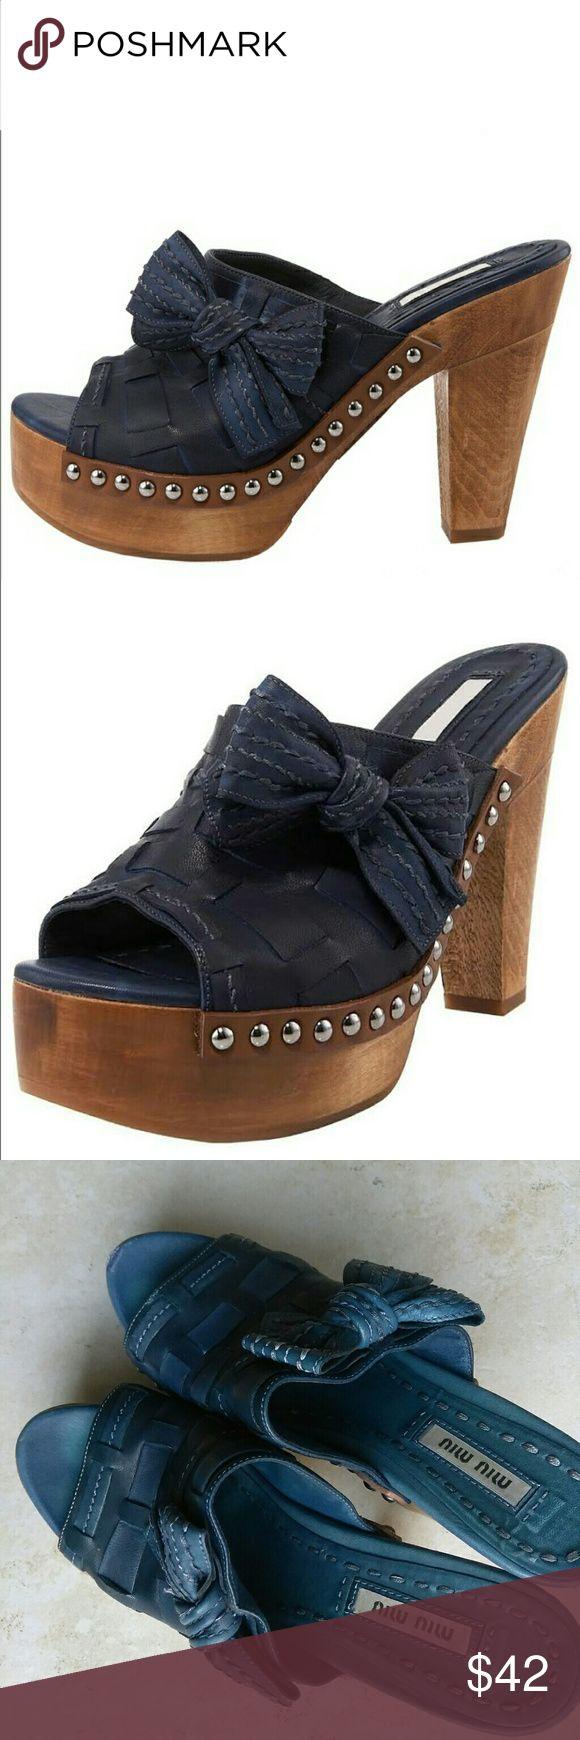 Miu Miu Leather Criss Cross Peeptoe Mule Clog Retails $320+• Used Miu Miu Leather Criss Cross Peeptoe Mule Clogs with Bows super cute ! Can be repaired for any miu miu lovers 💕 I If they were my size I'd keep 💕😭😭😭 #miumiu Miu Miu Shoes Mules & Clogs